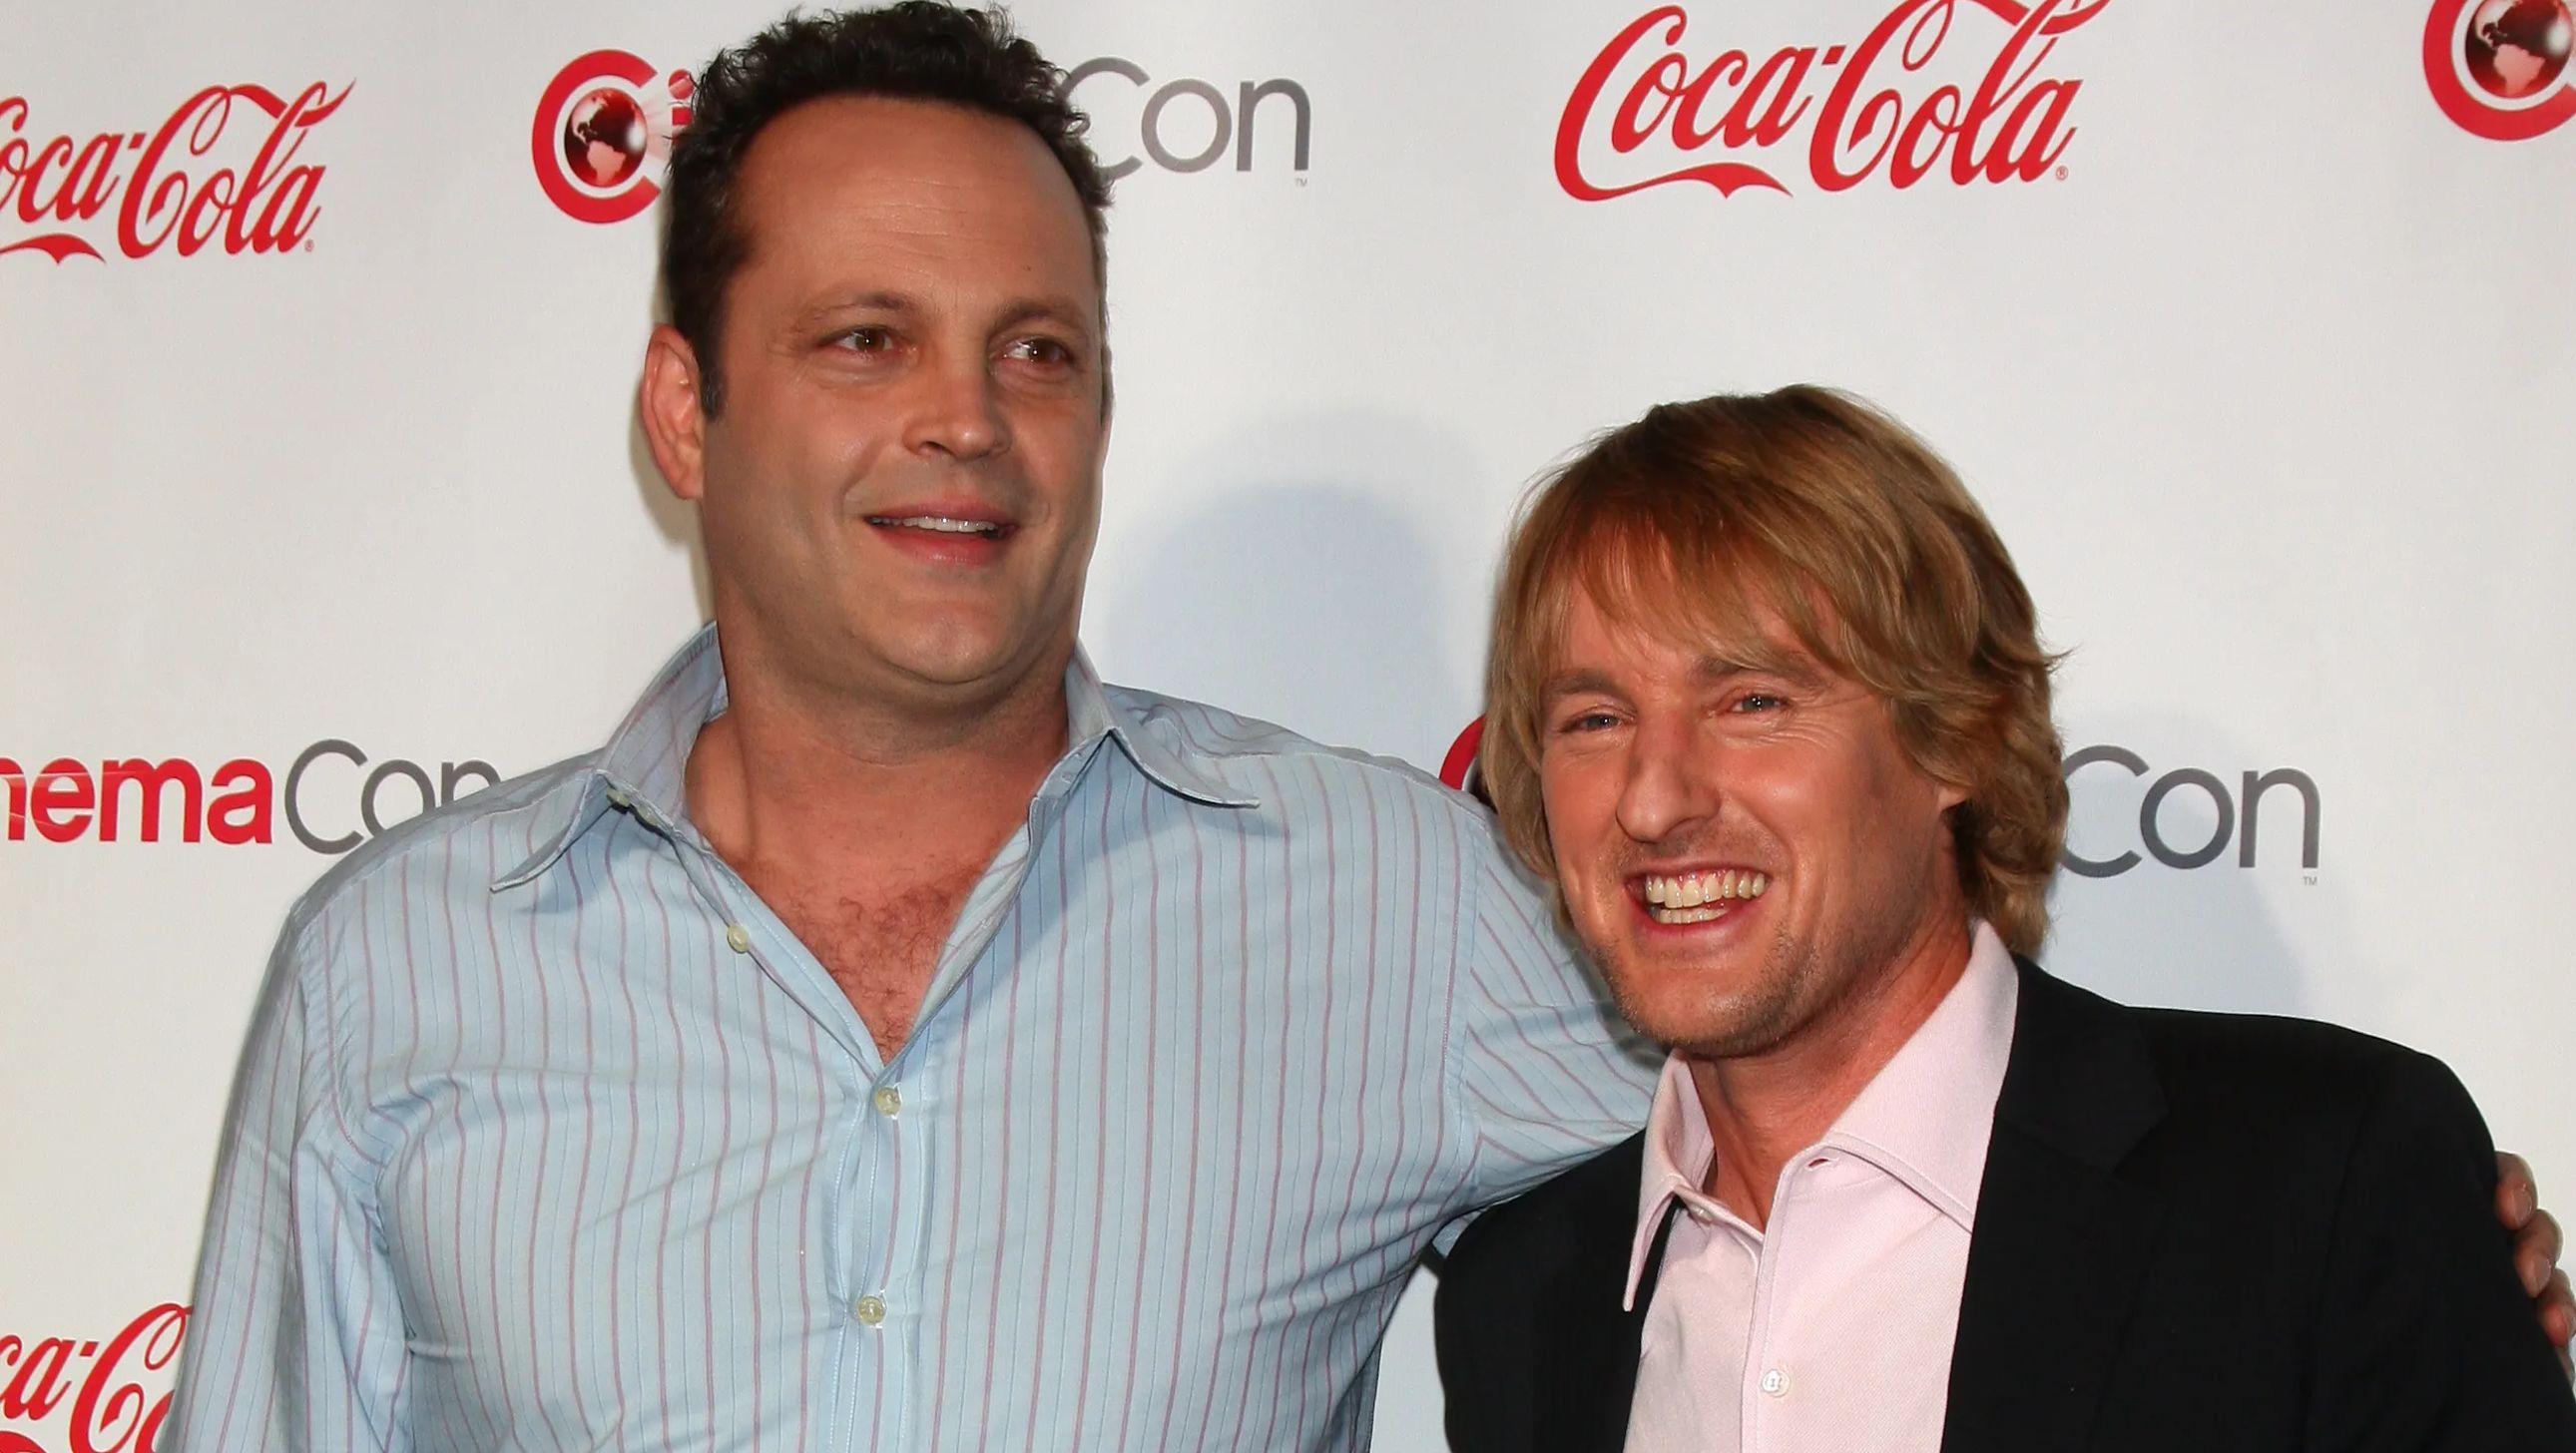 Vinve Vaughn & Owen Wilson smiling at CinemaCon